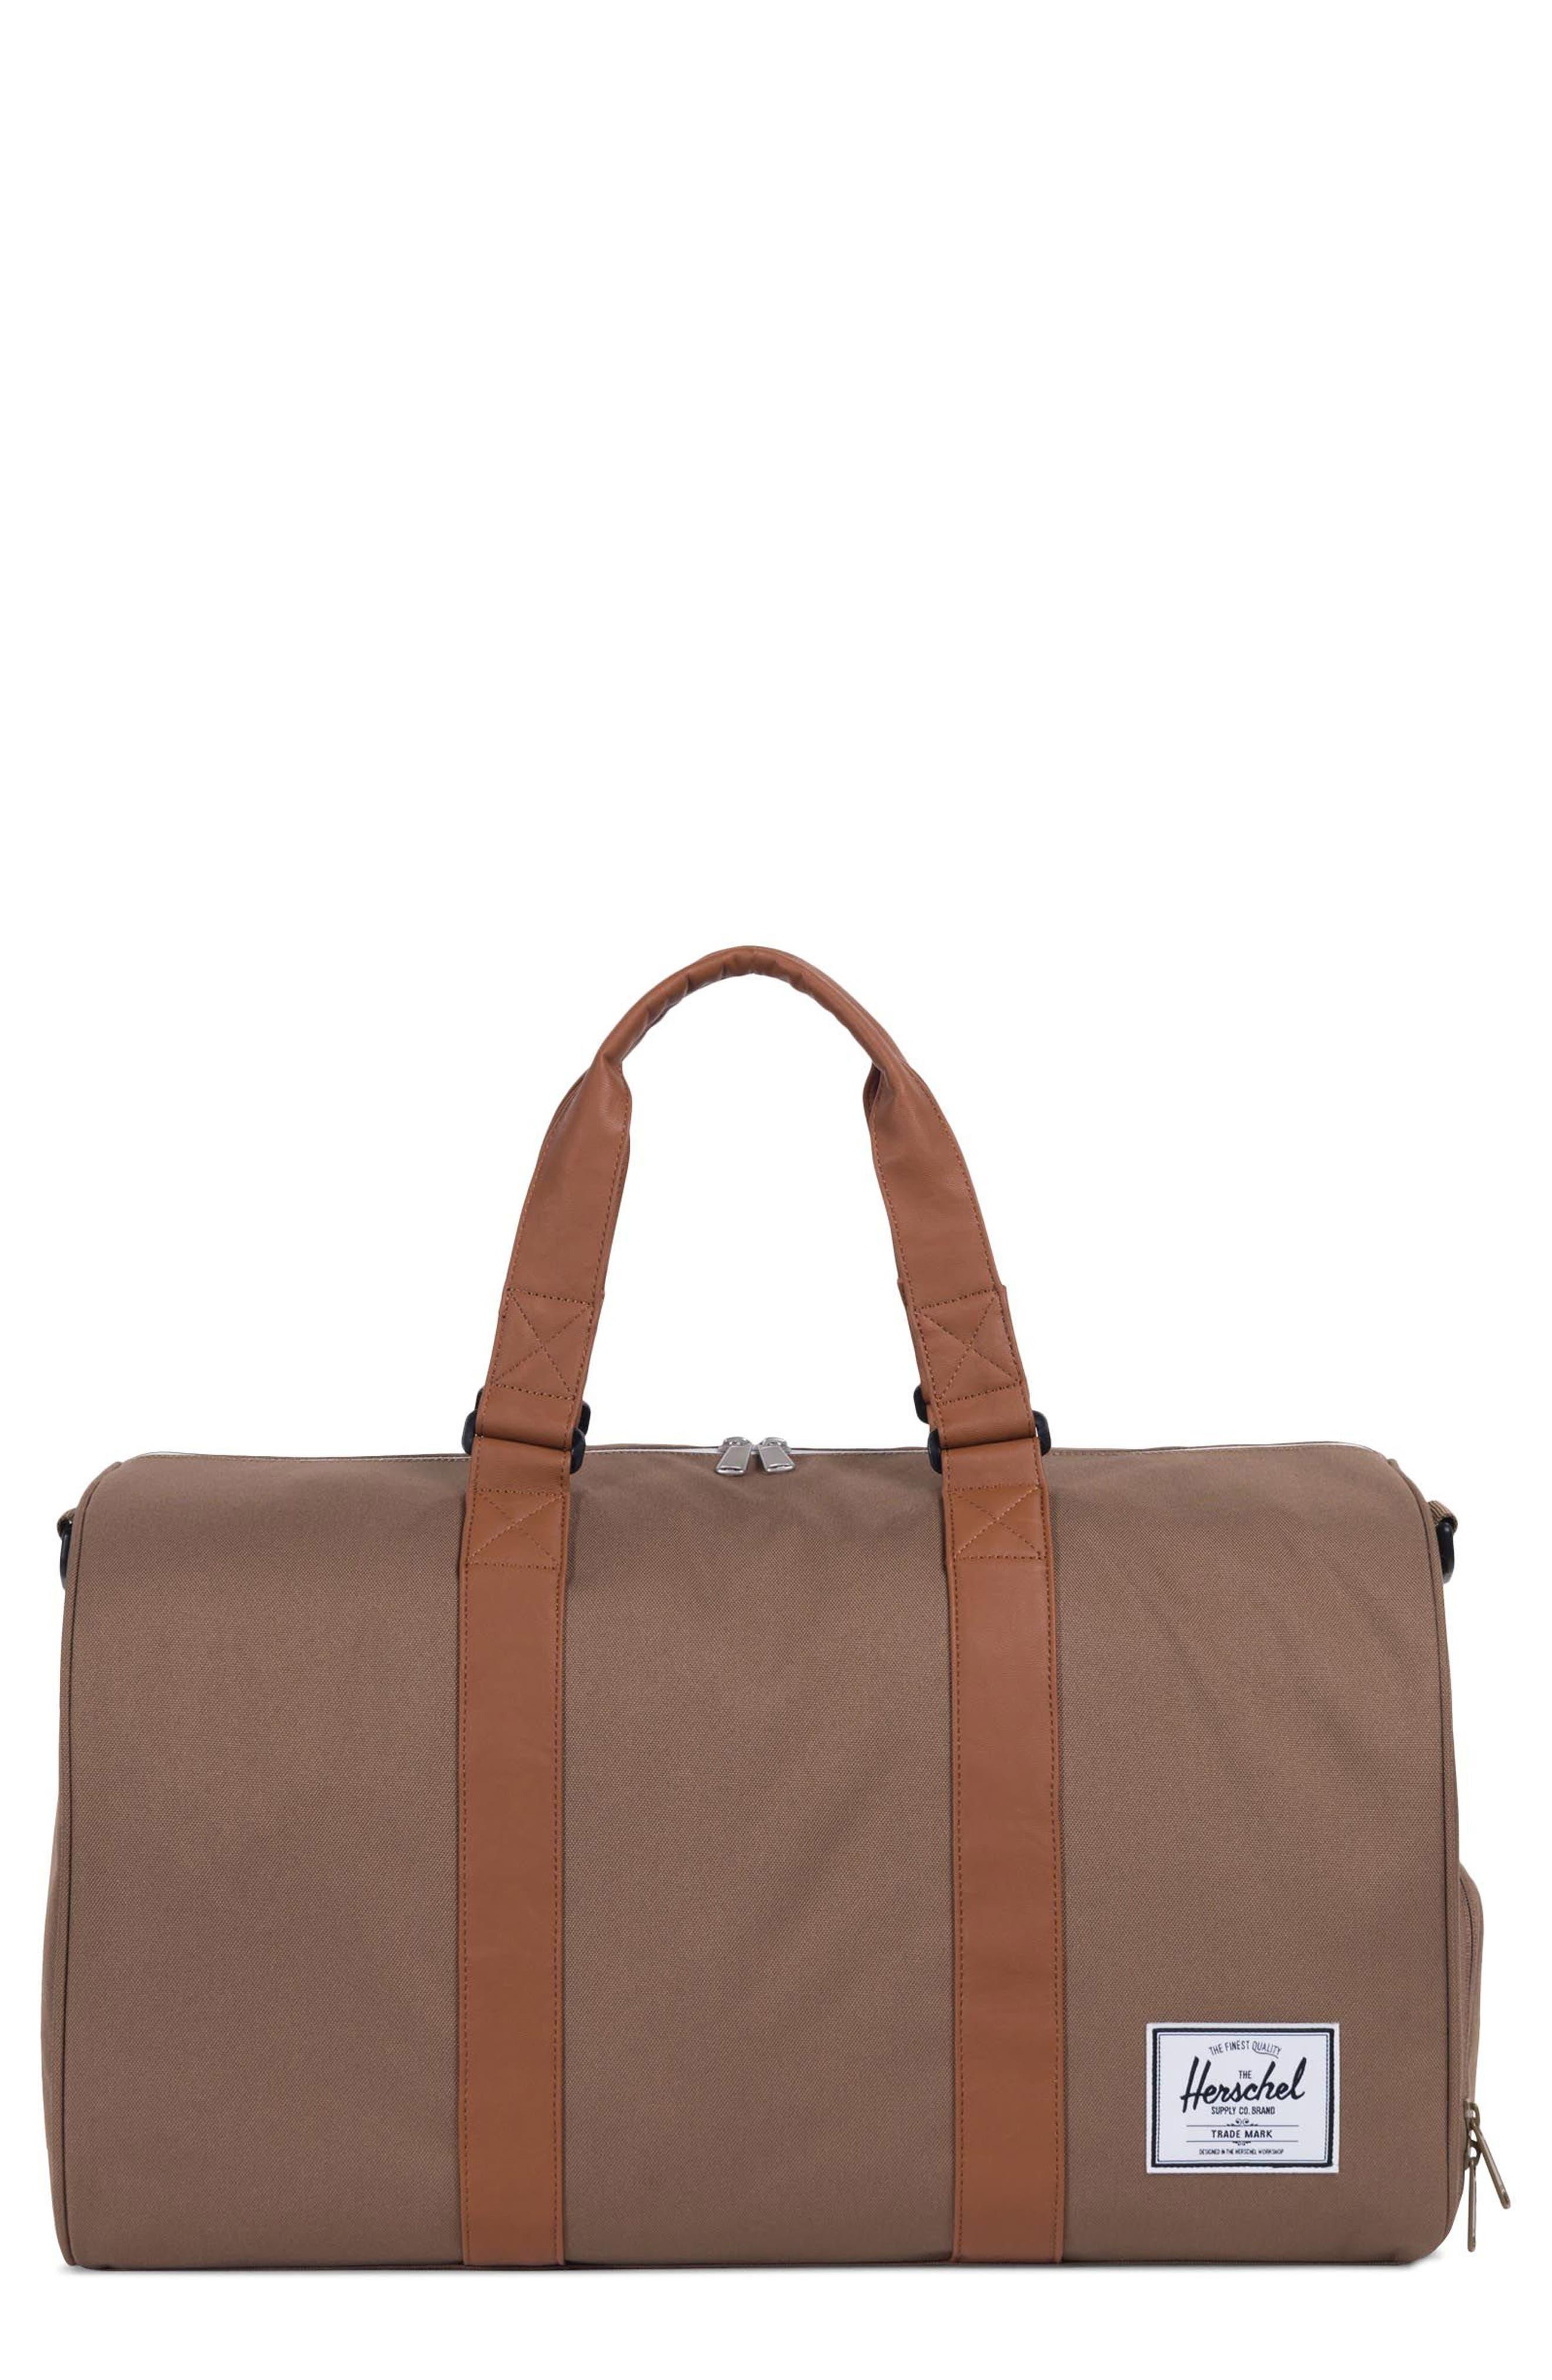 'Novel' Duffel Bag,                             Alternate thumbnail 33, color,